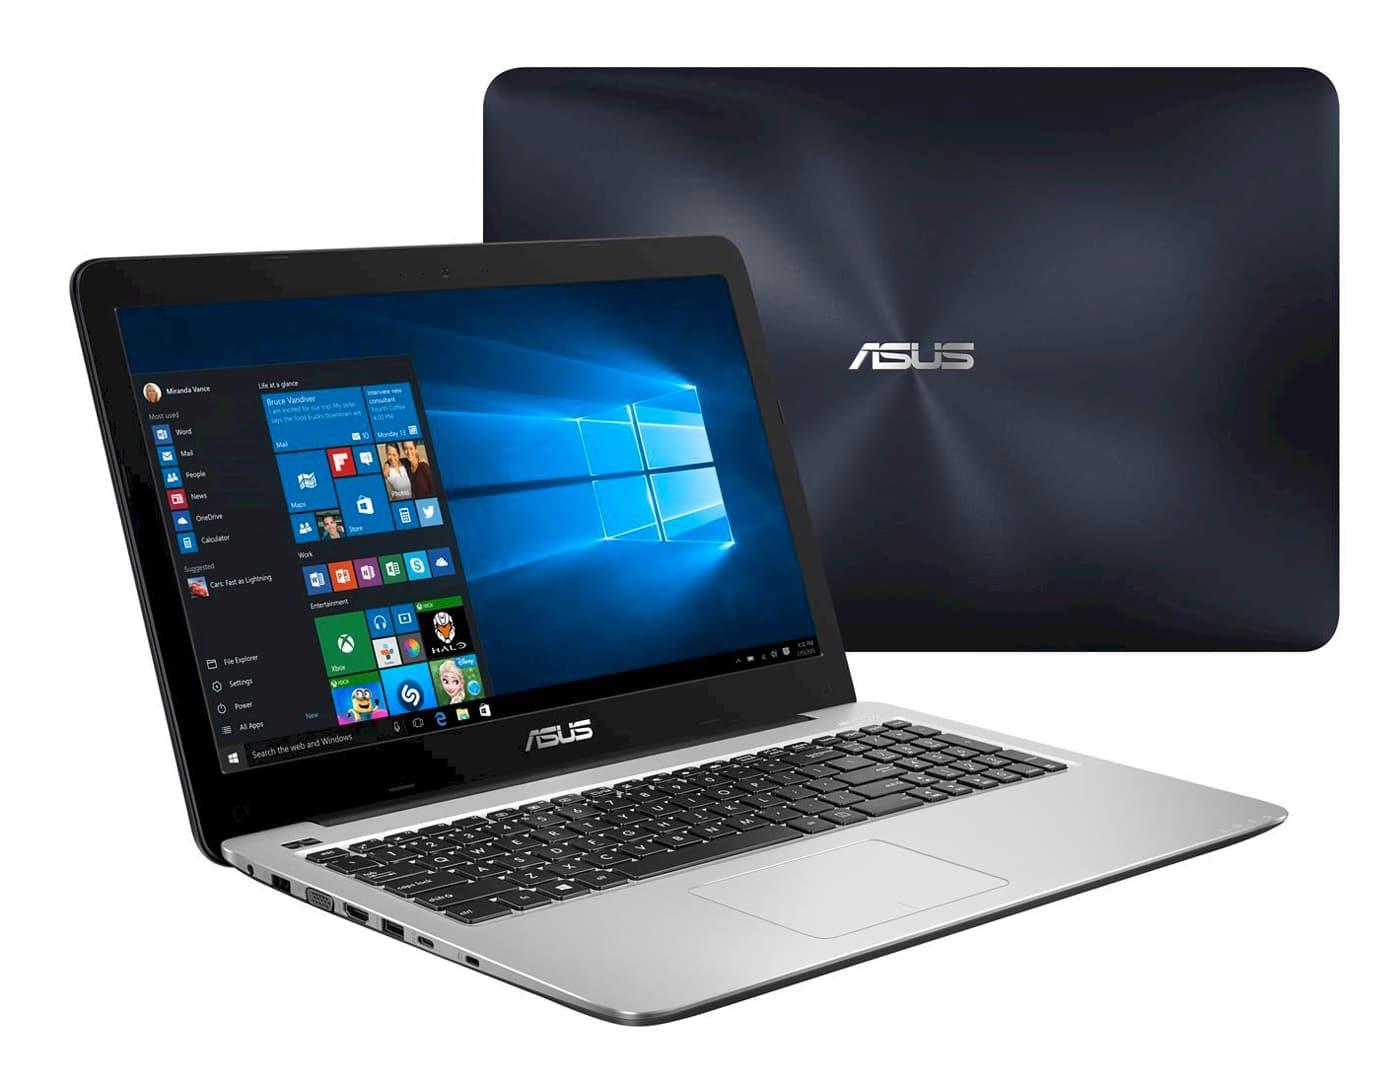 Asus R558UR-DM324T à 699€, PC portable 15 pouces Full HD 930MX i5 Kaby Lake